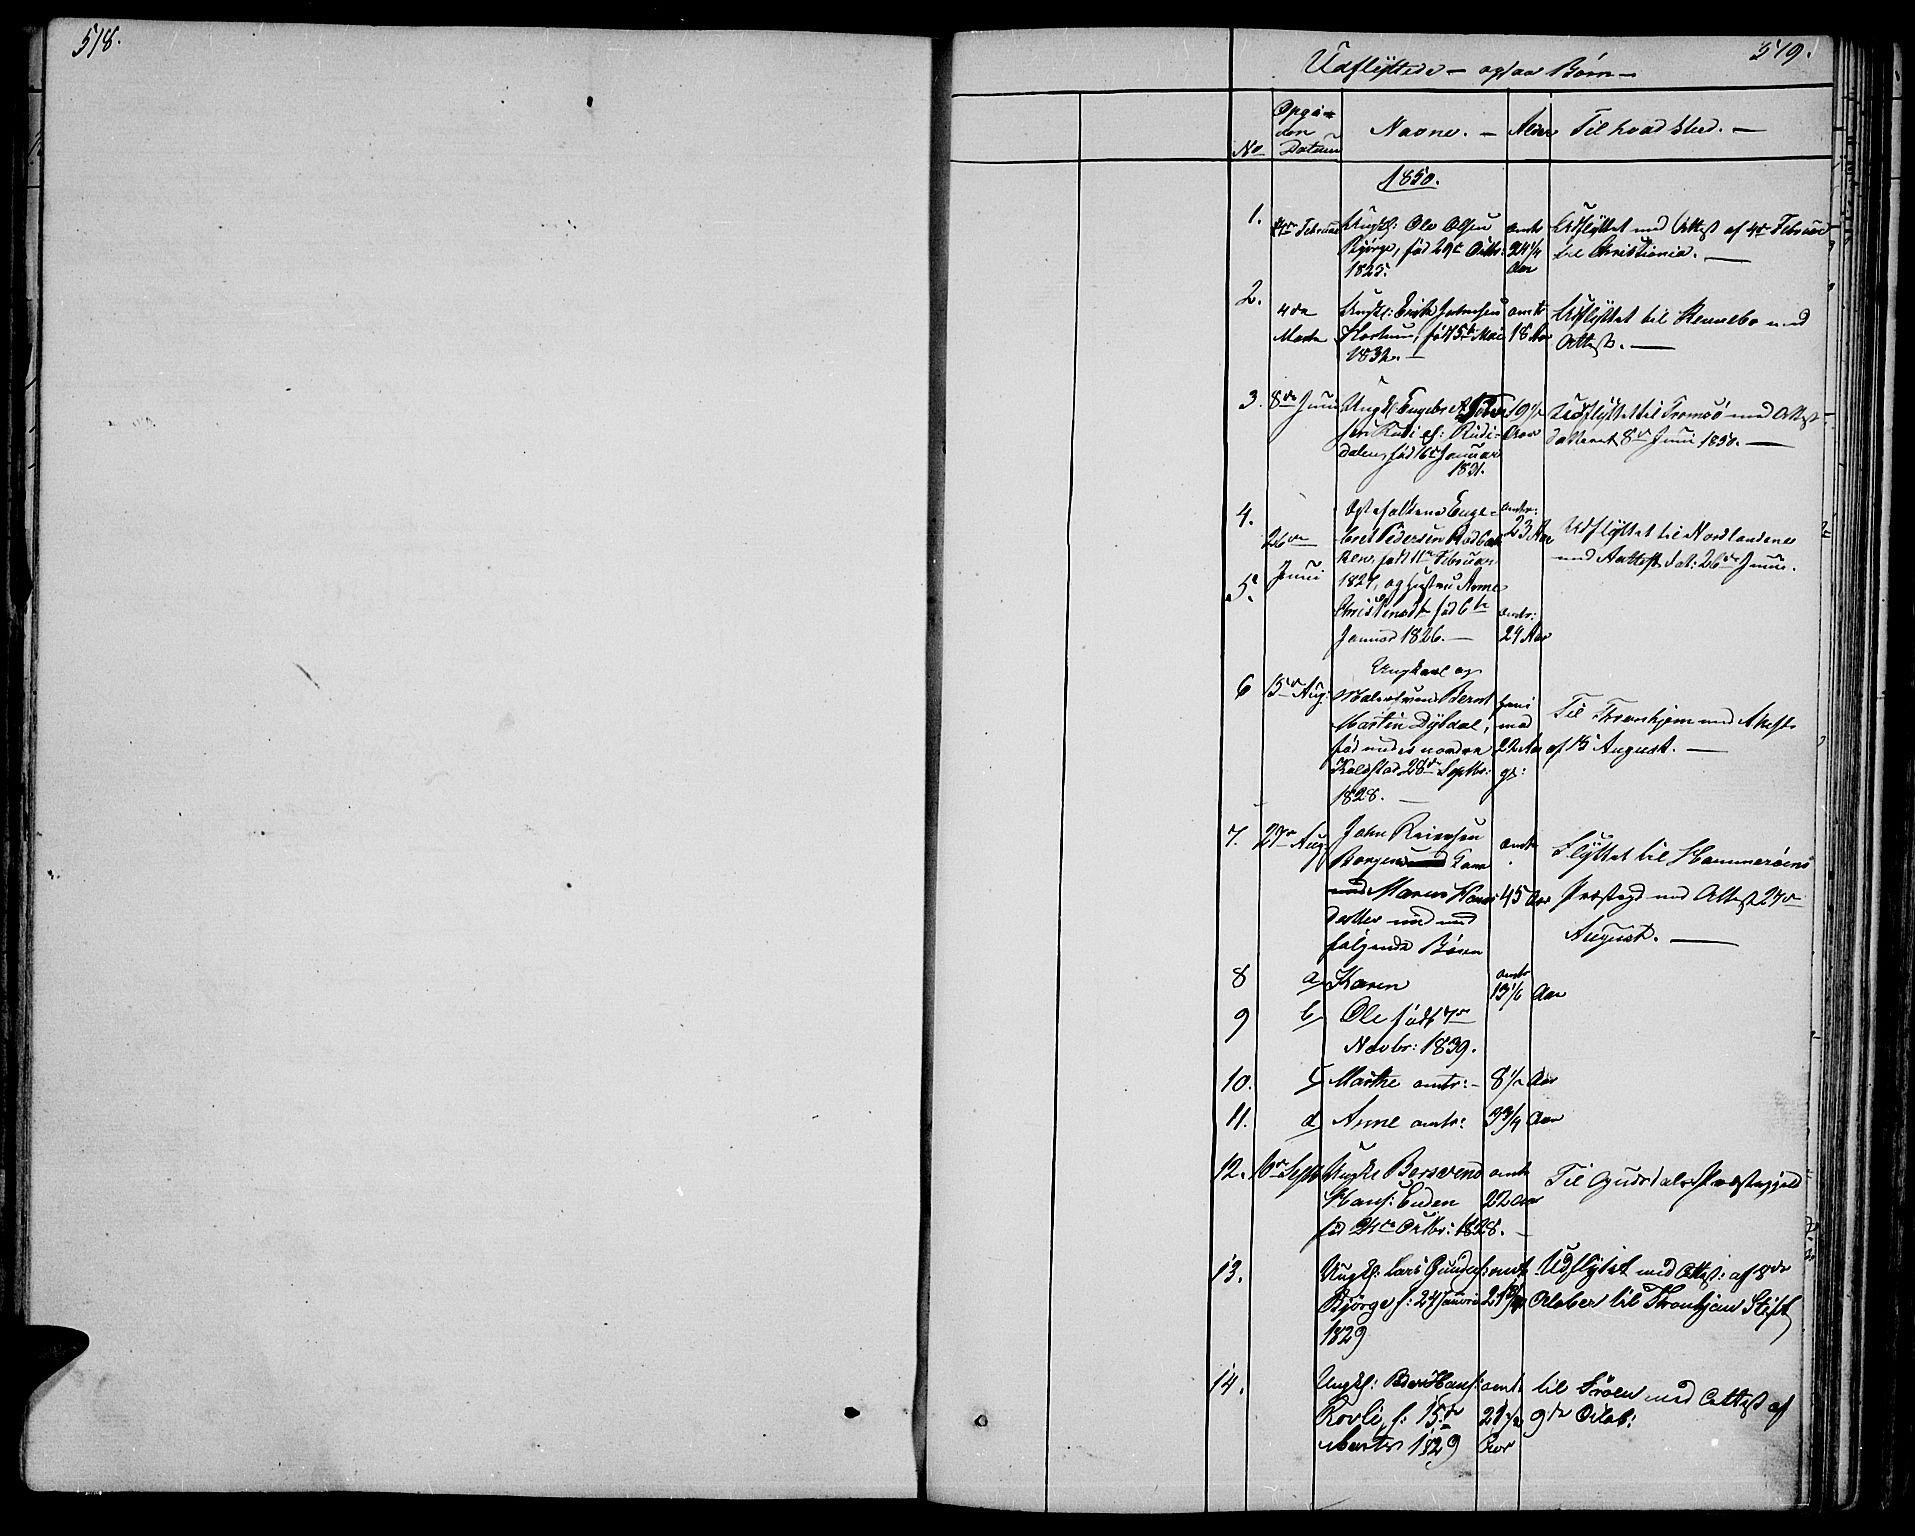 SAH, Ringebu prestekontor, Klokkerbok nr. 2, 1839-1853, s. 518-519